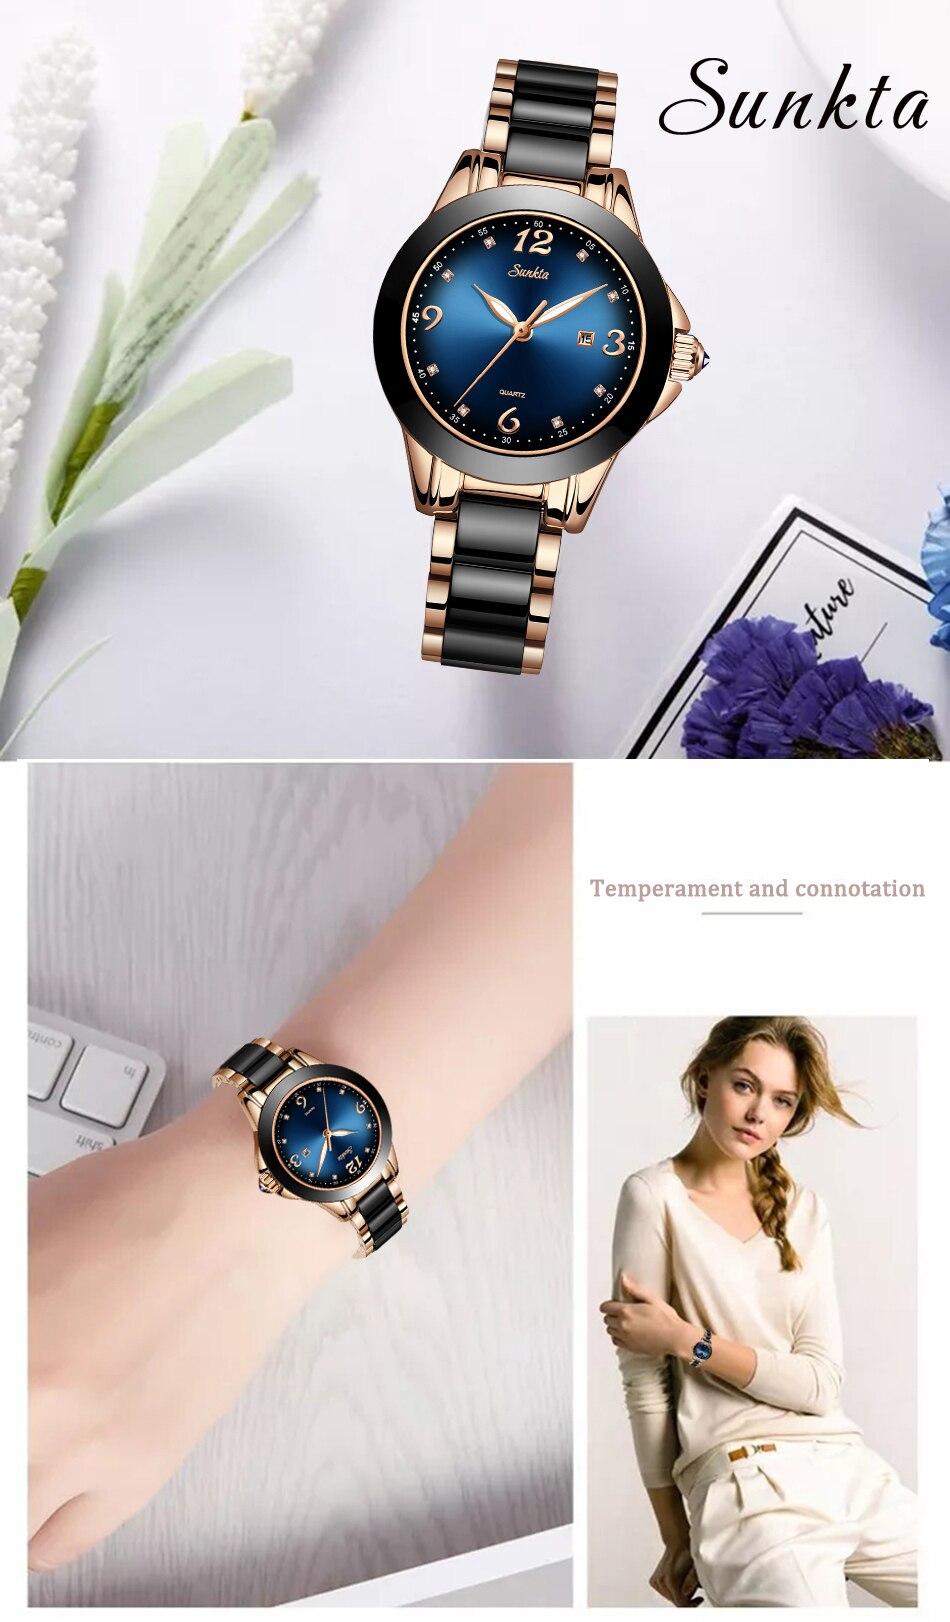 SUNKTA Azul Mulheres Moda Relógios Senhoras Relógios